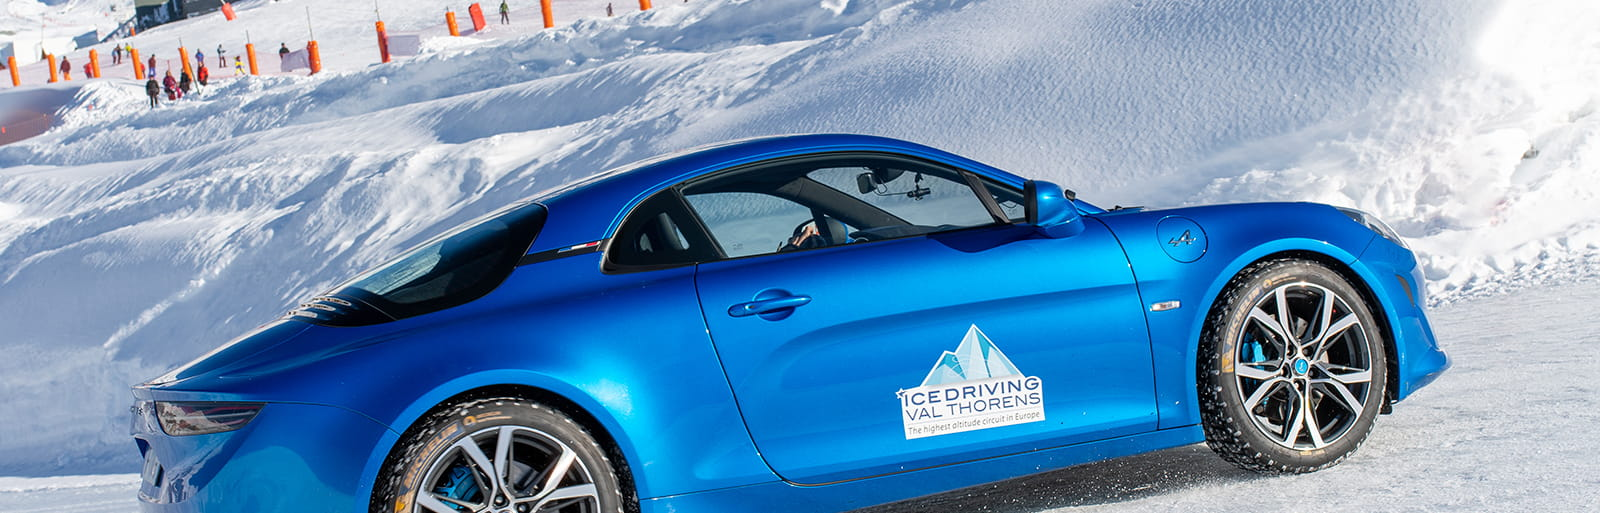 Ice driving à Val Thorens